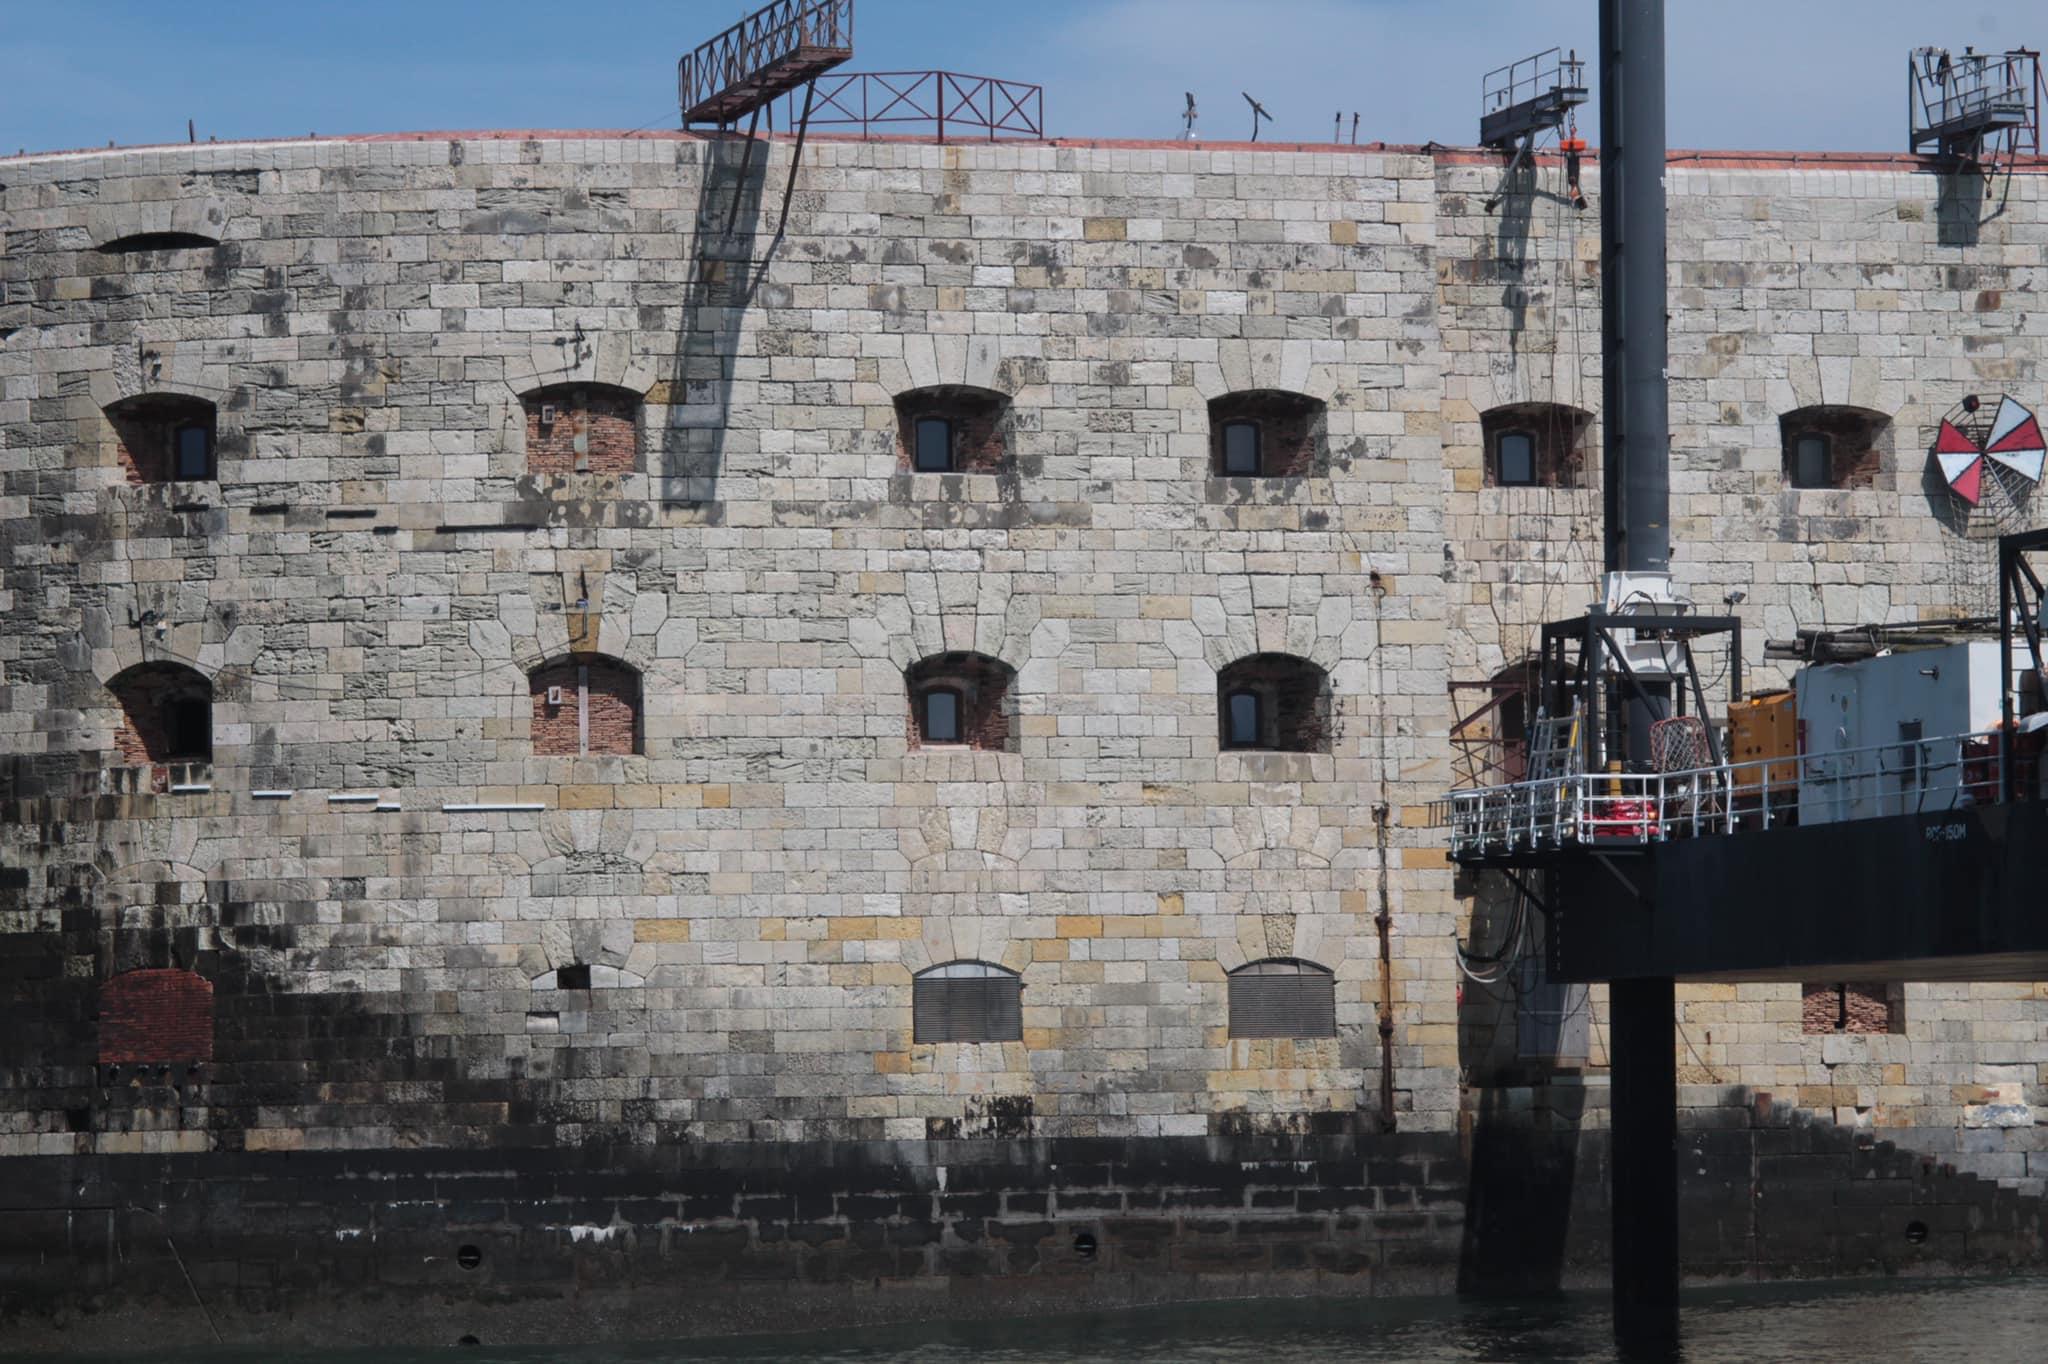 Photos des tournages Fort Boyard 2021 (production + candidats) - Page 6 18391810